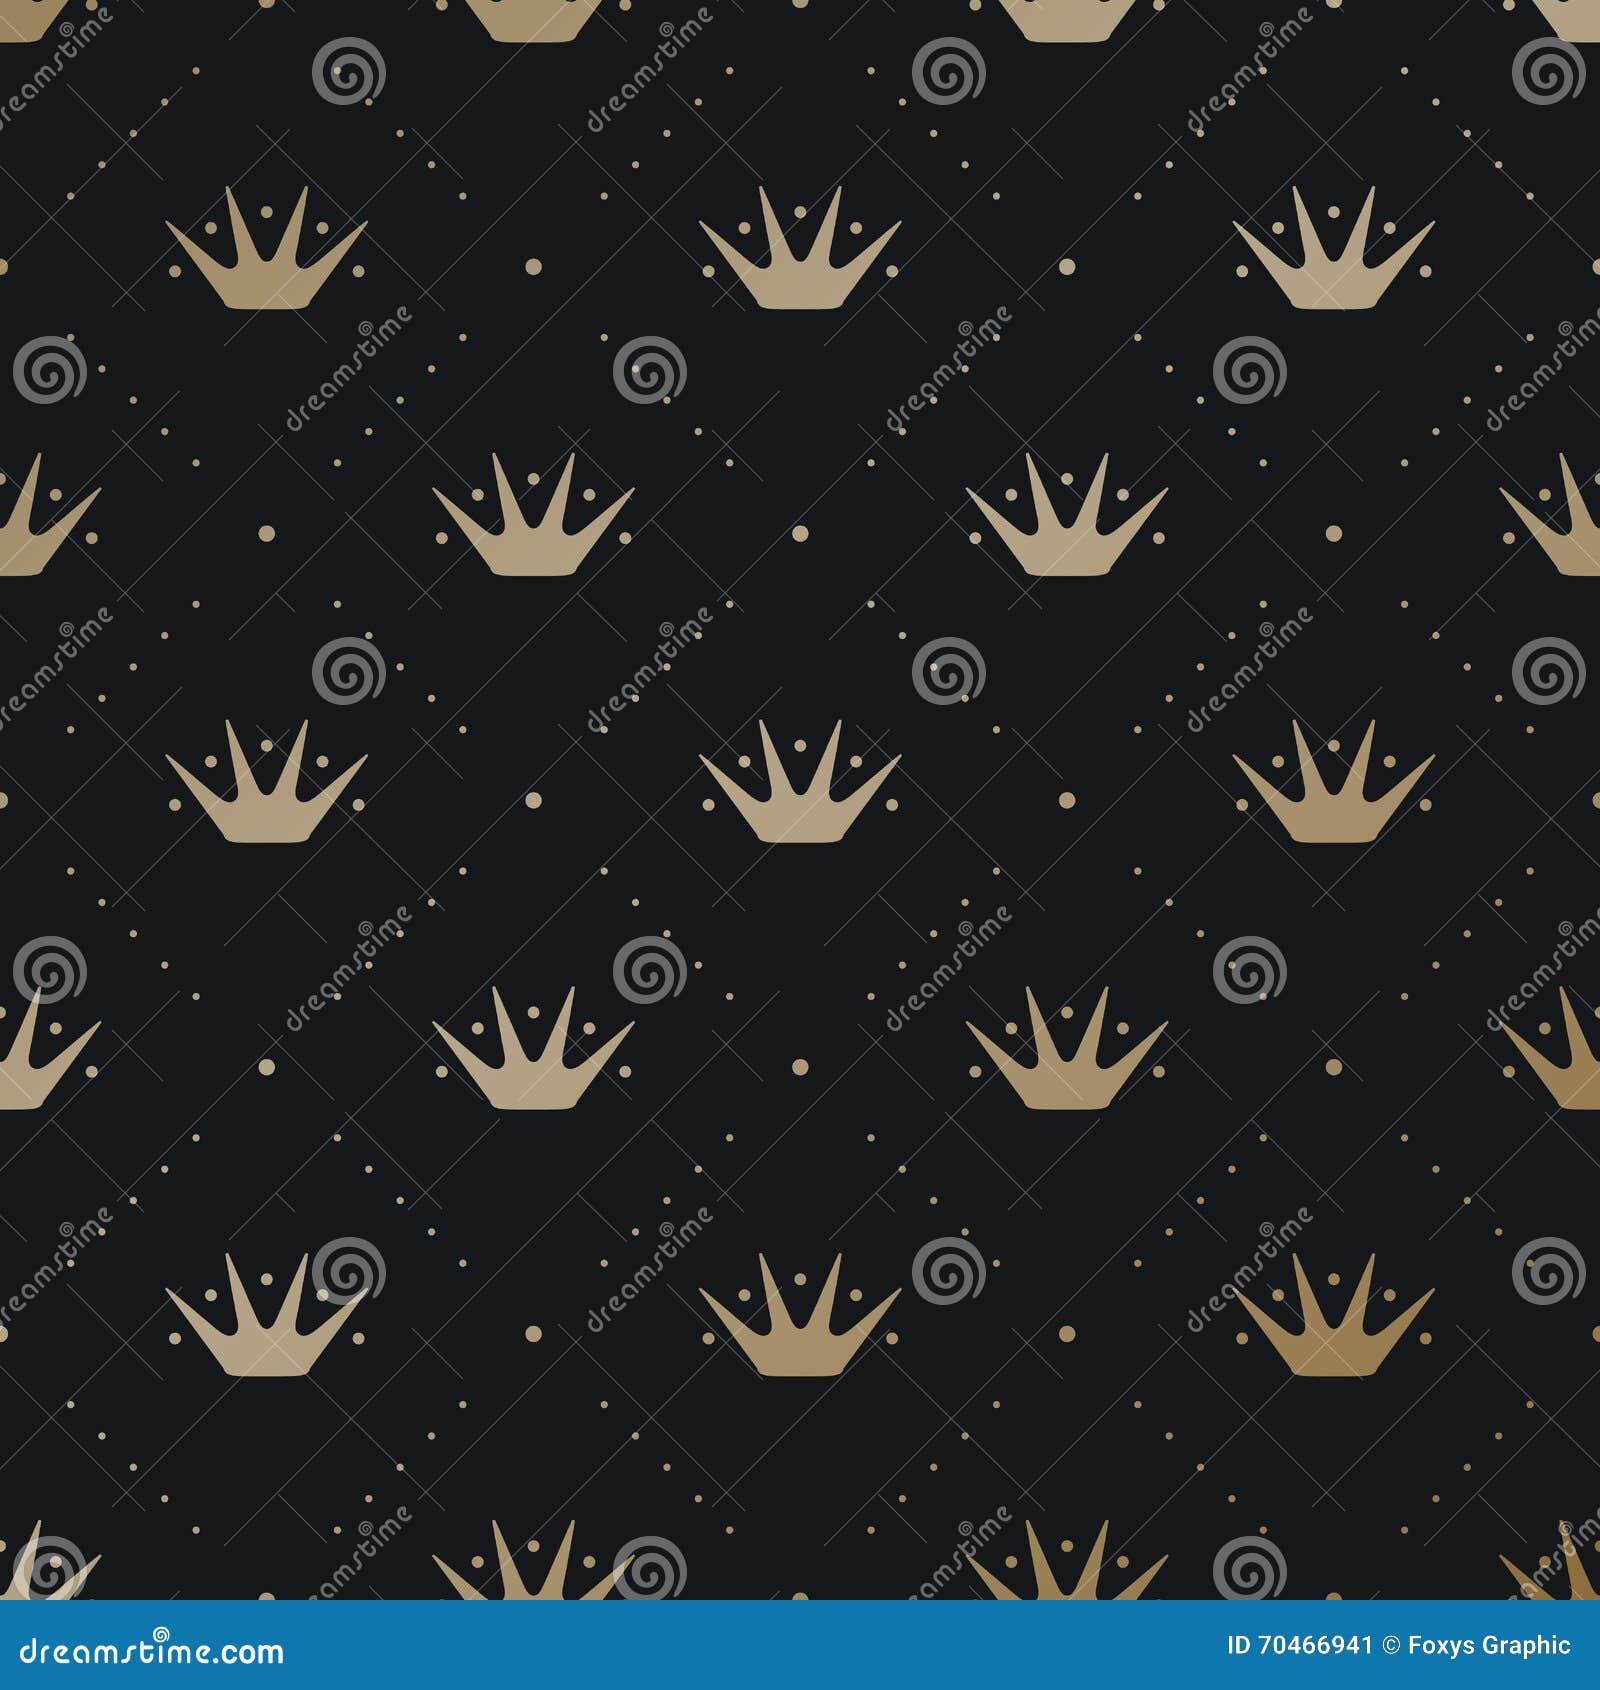 King crown black background